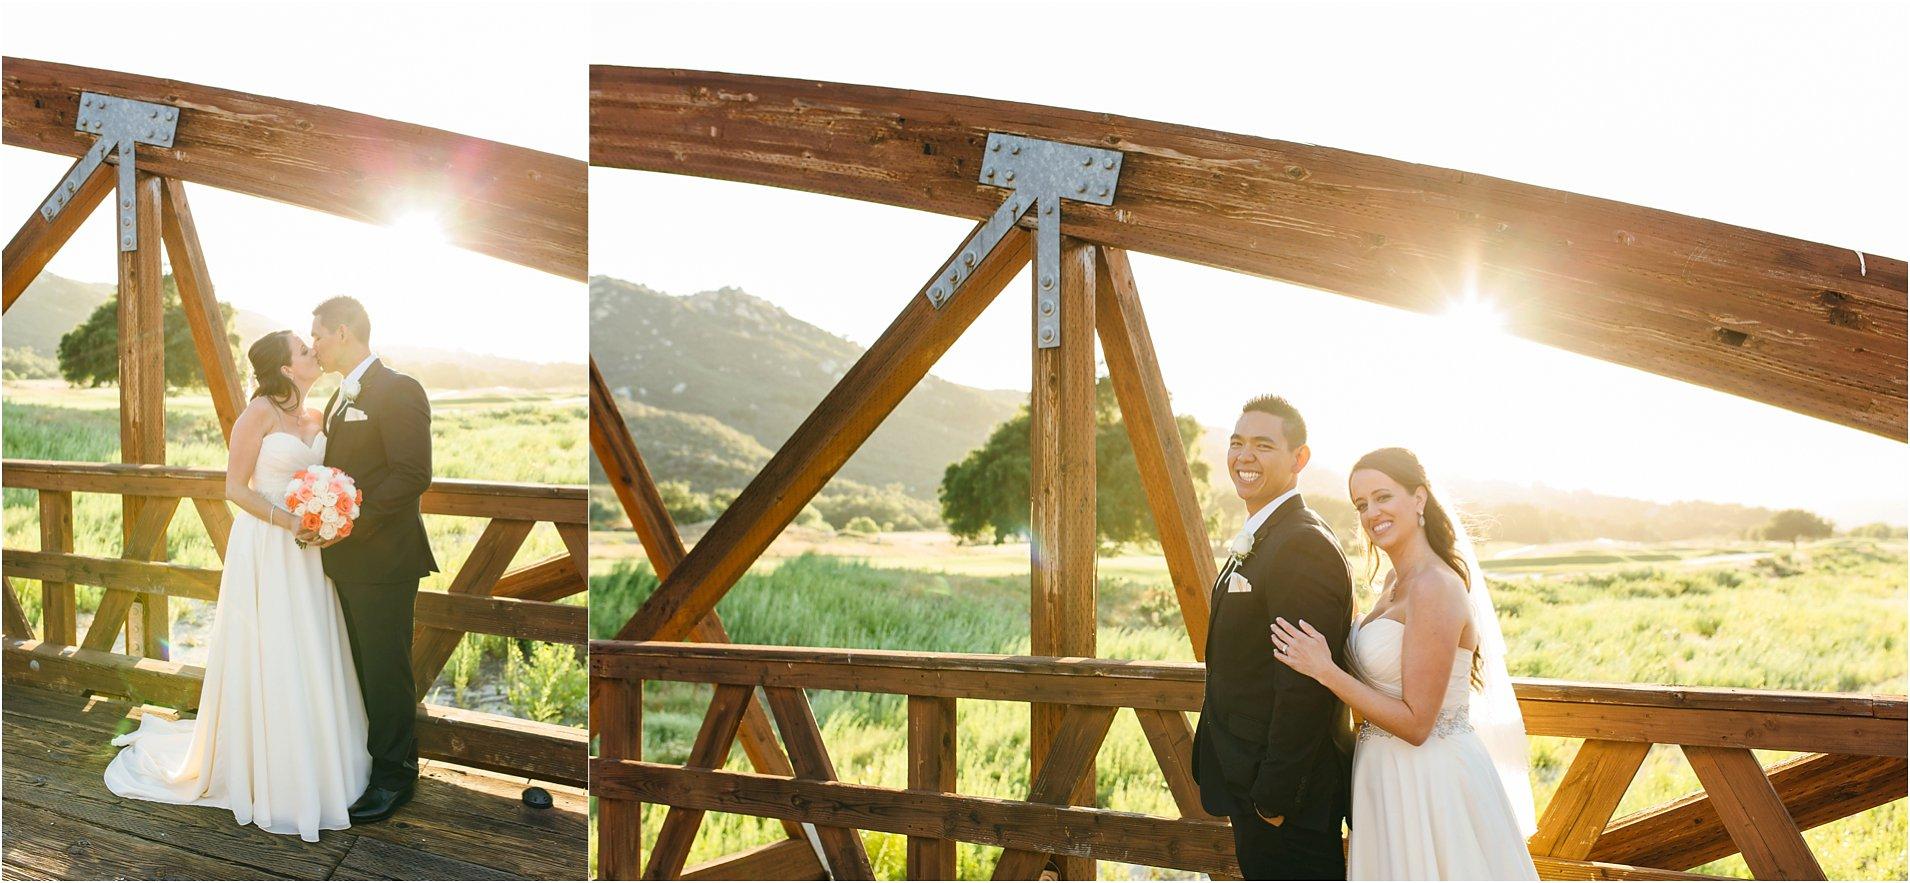 temecula wedding photographer, wedding at journeys end